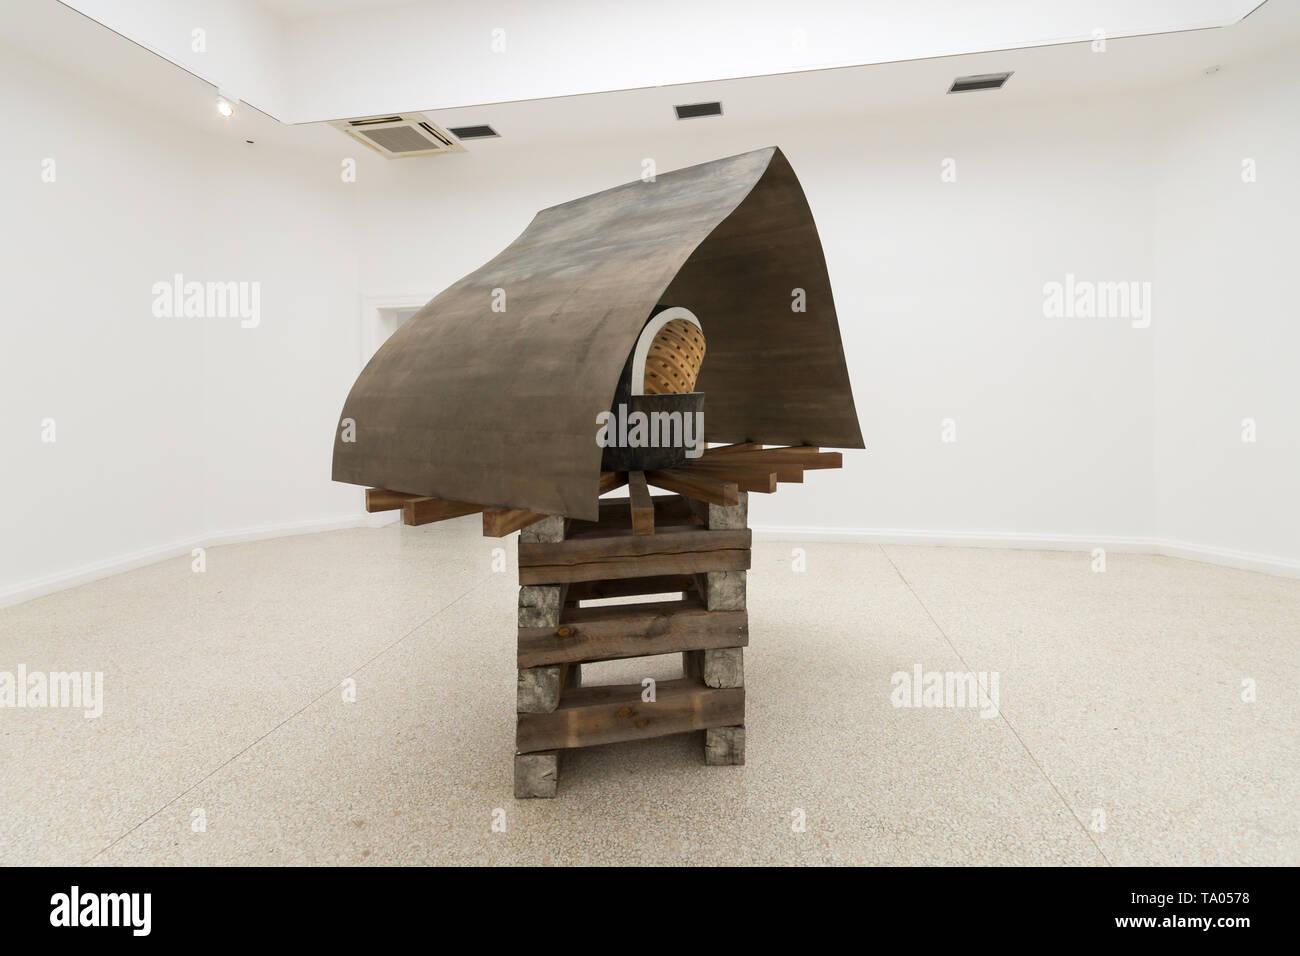 Martin Puryear, Cloister-Redoubt or Cloistered Doubt, 2019, sculpture, Liberty / Libertà exhibition, United States Pavilion, Venice Art Biennale 2019 - Stock Image